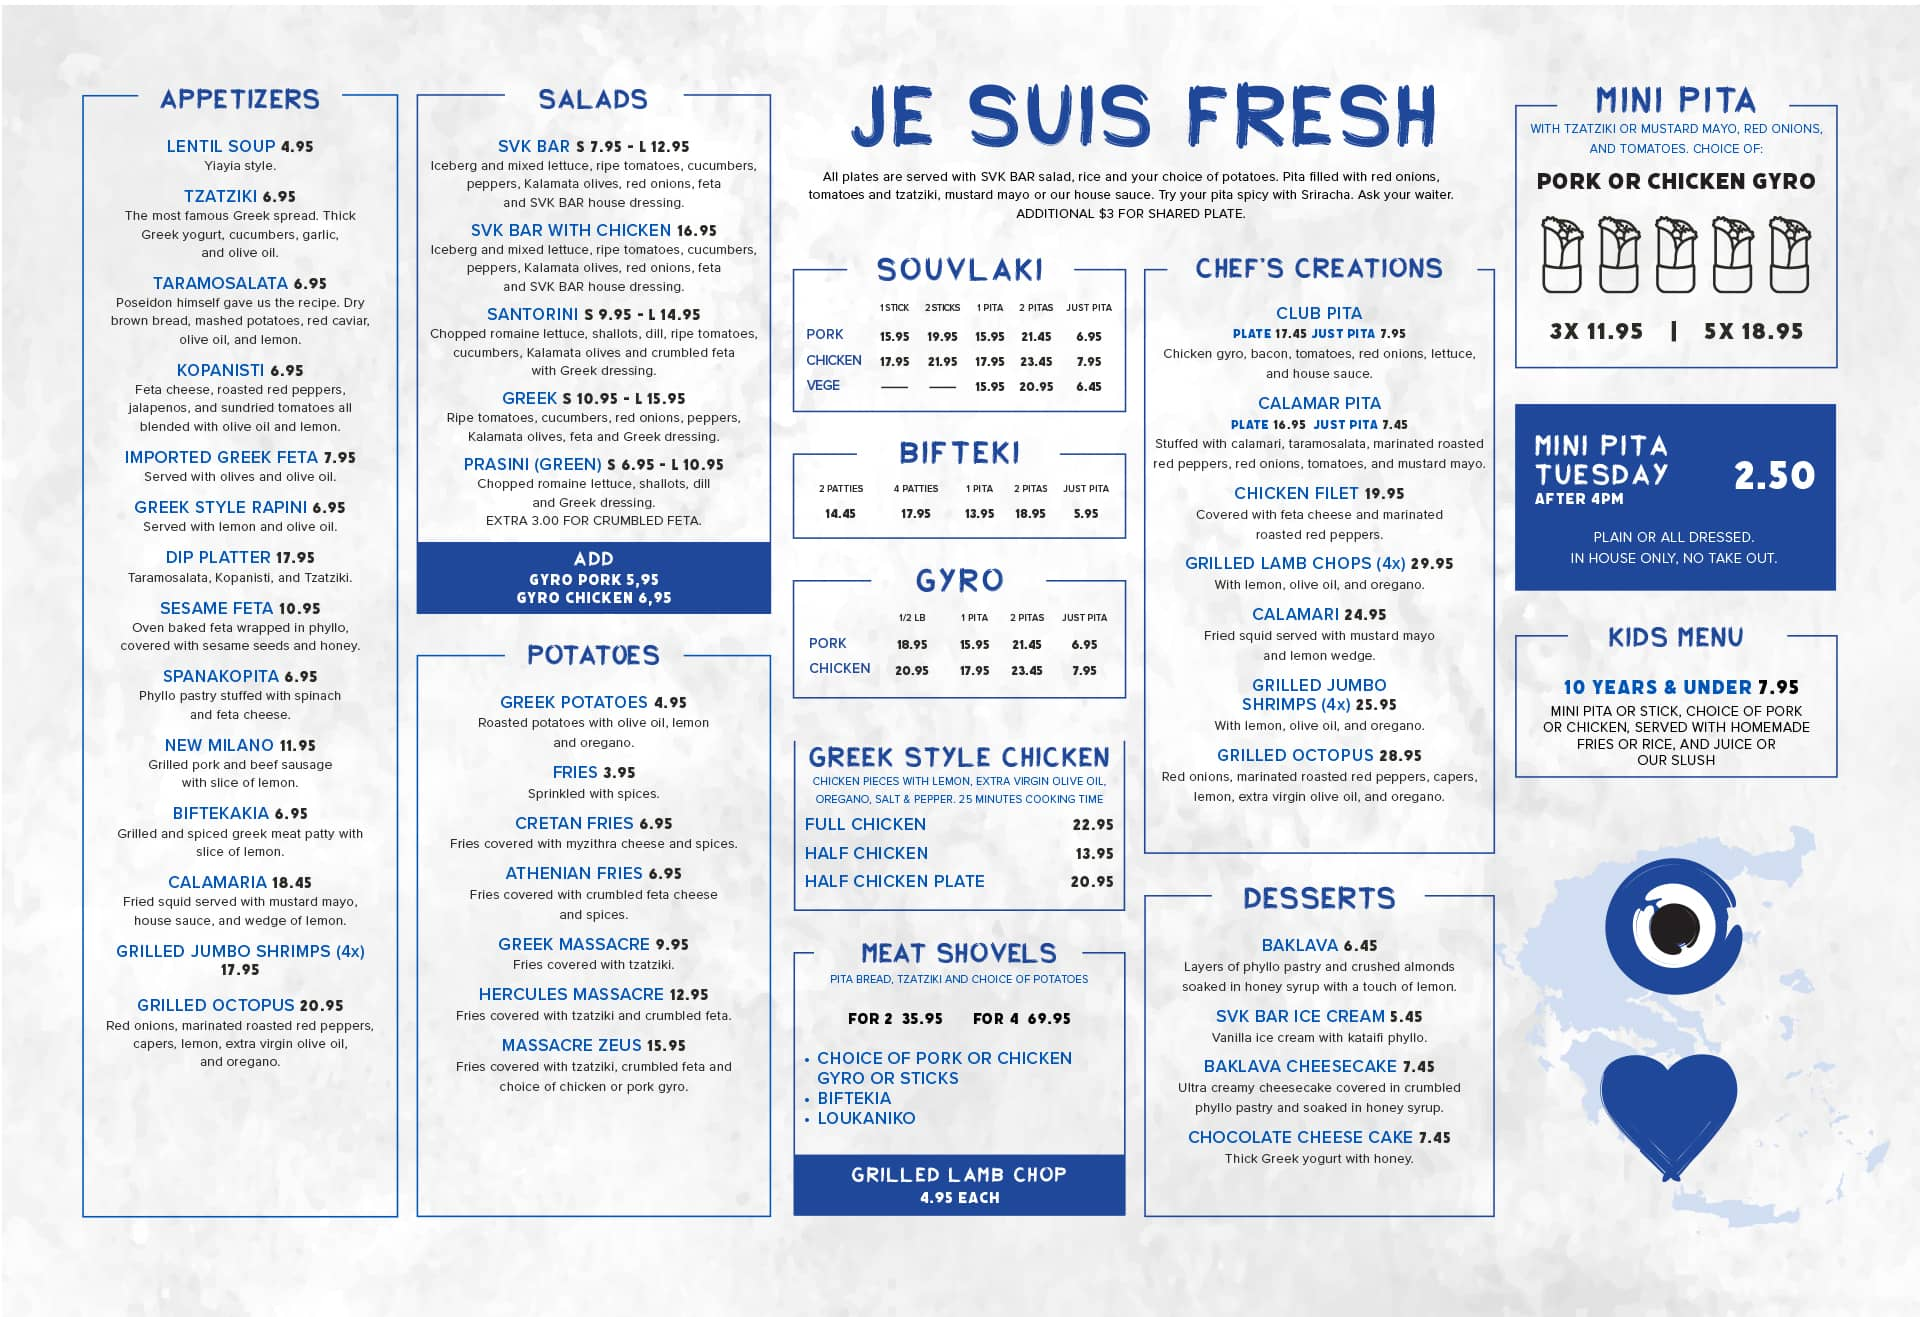 Food menu with appetizers, salads, souvlakis, gyro, chicken, pitas and kids menu